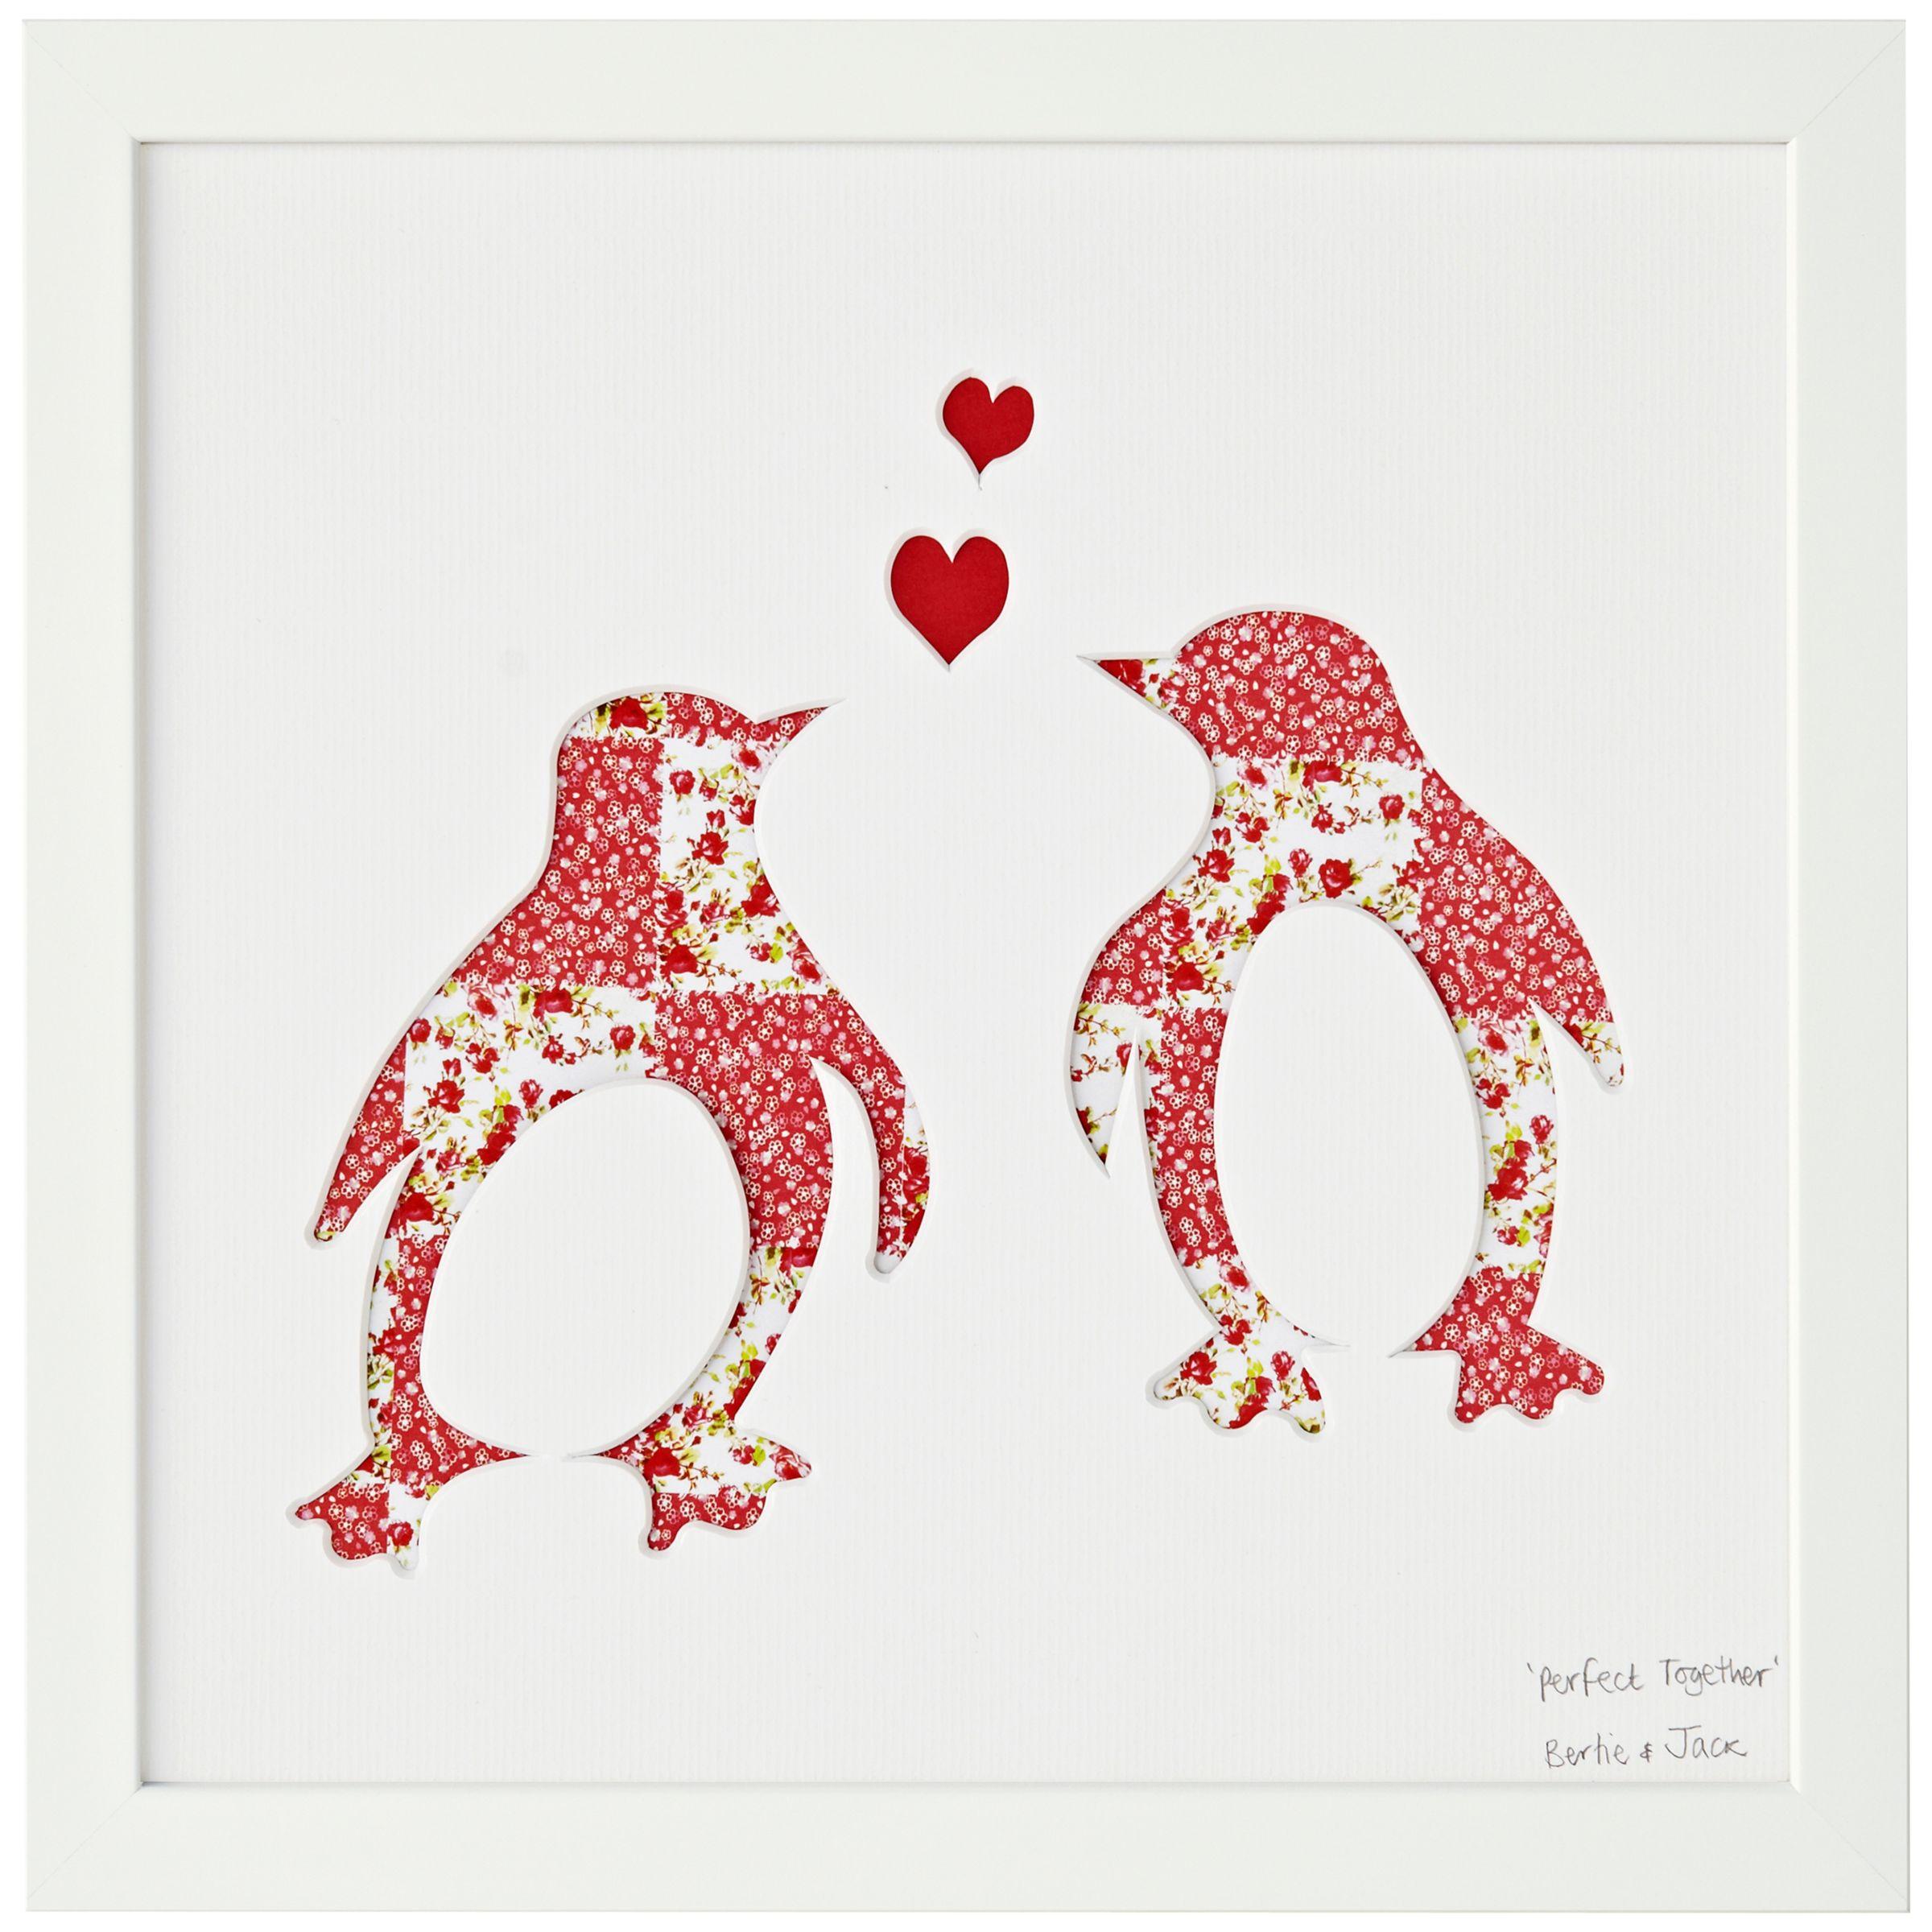 Bertie & Jack Bertie & Jack 'Perfect Together' Penguin Framed Cut-out, 27.4 x 27.4cm